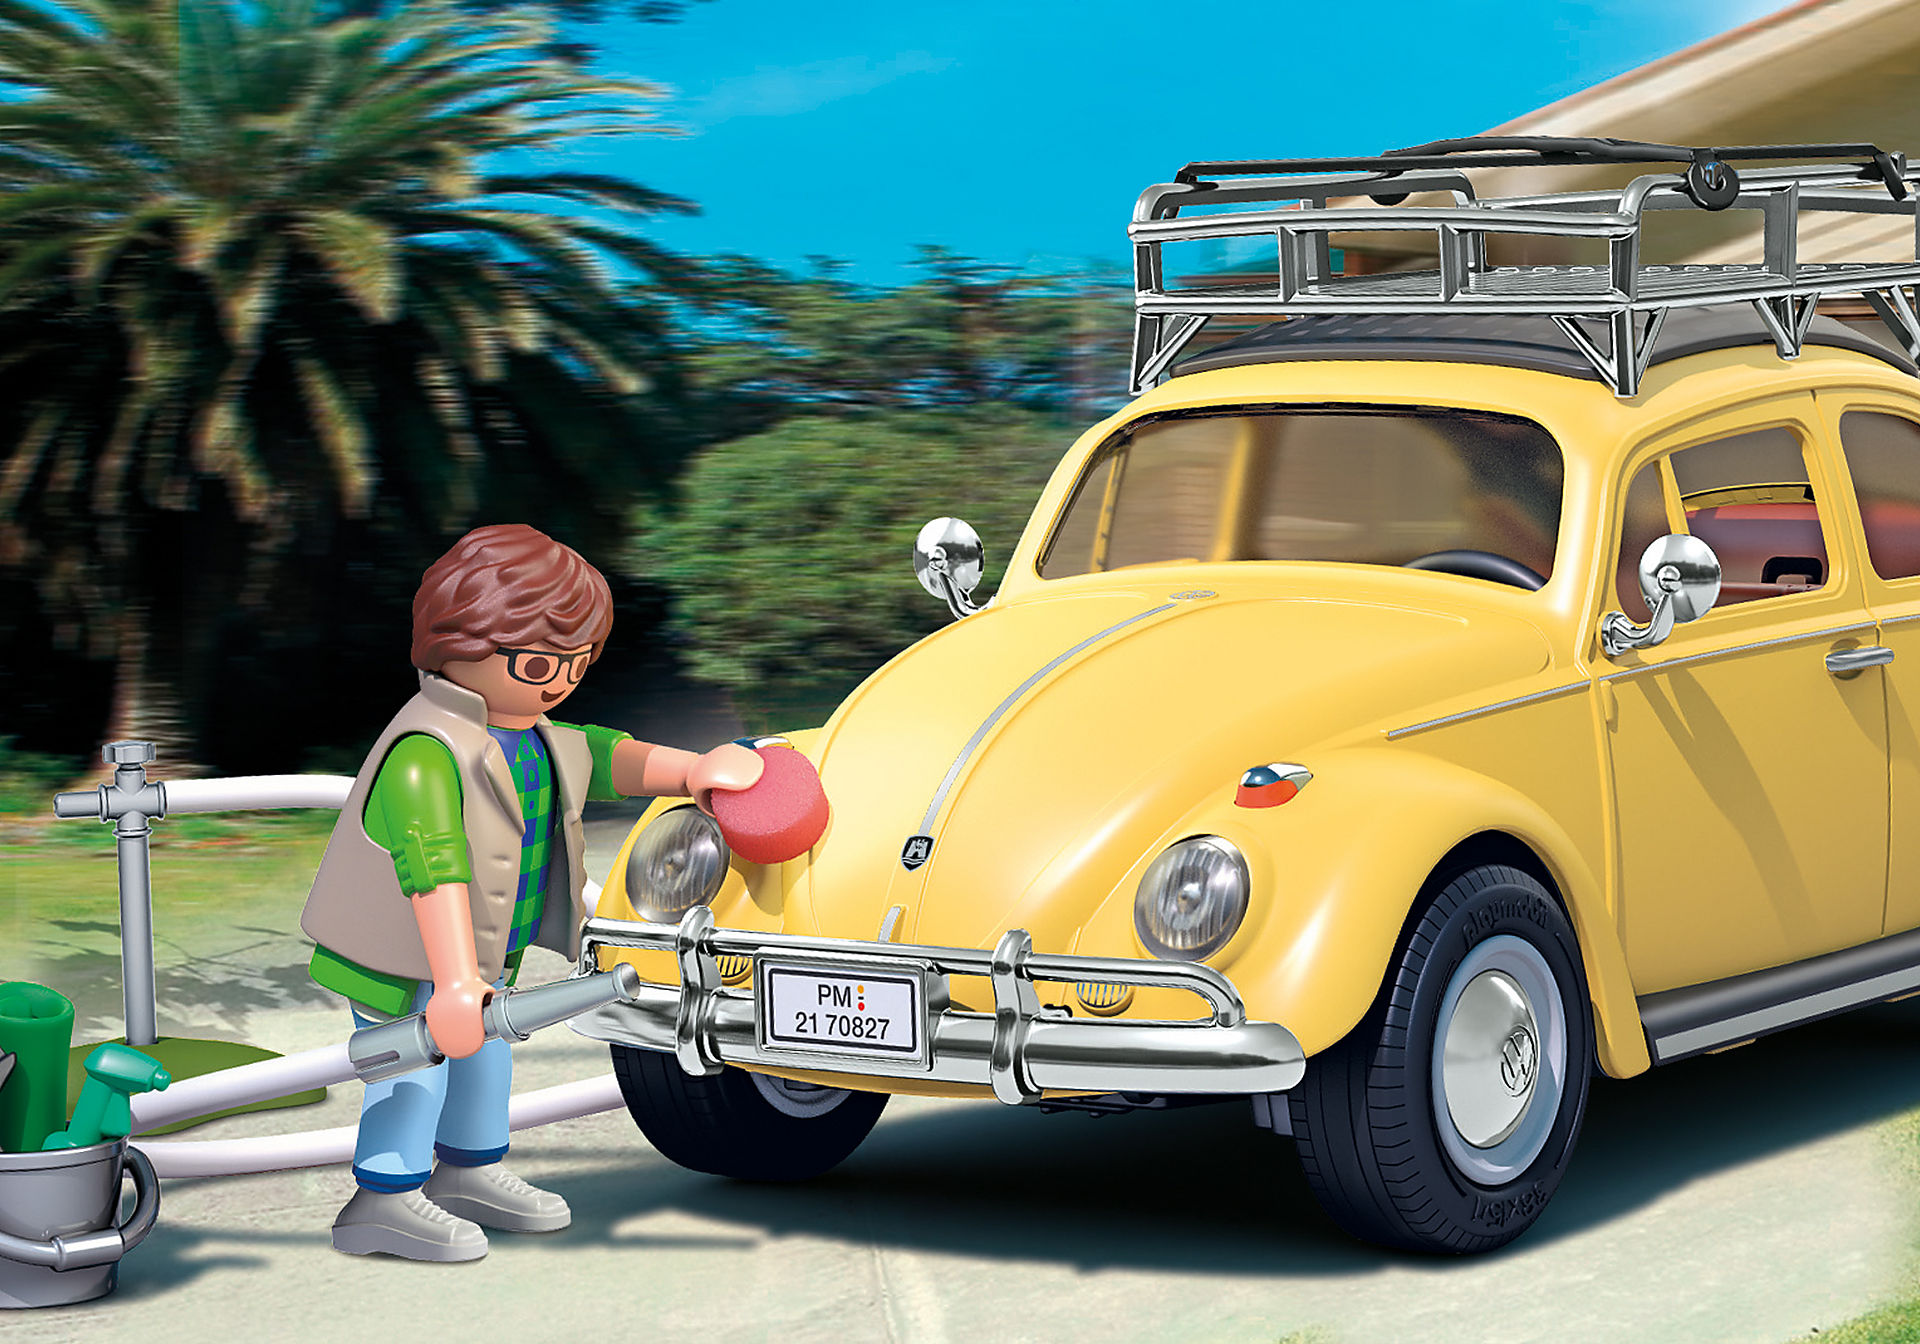 70827 Volkswagen Σκαραβαίος - Special Edition zoom image7